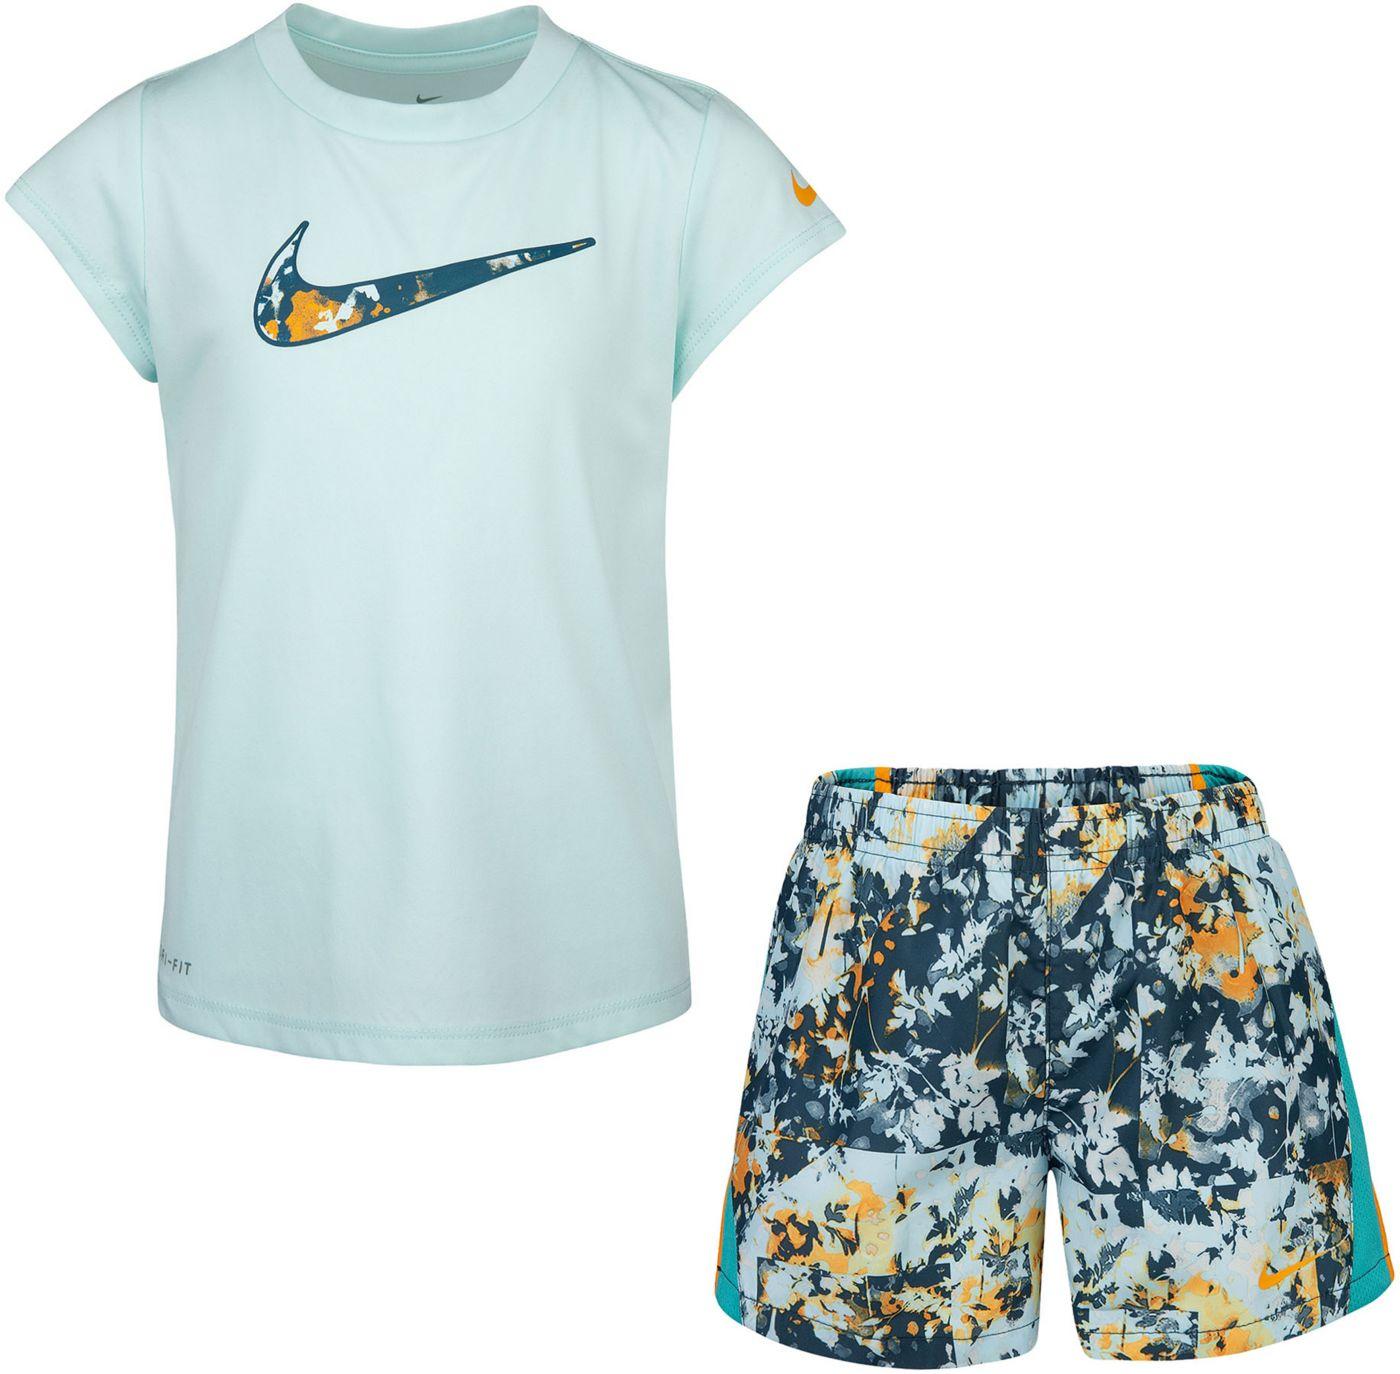 Nike Little Girls' Dri-FIT Graphic T-Shirt and 10K Shorts Set